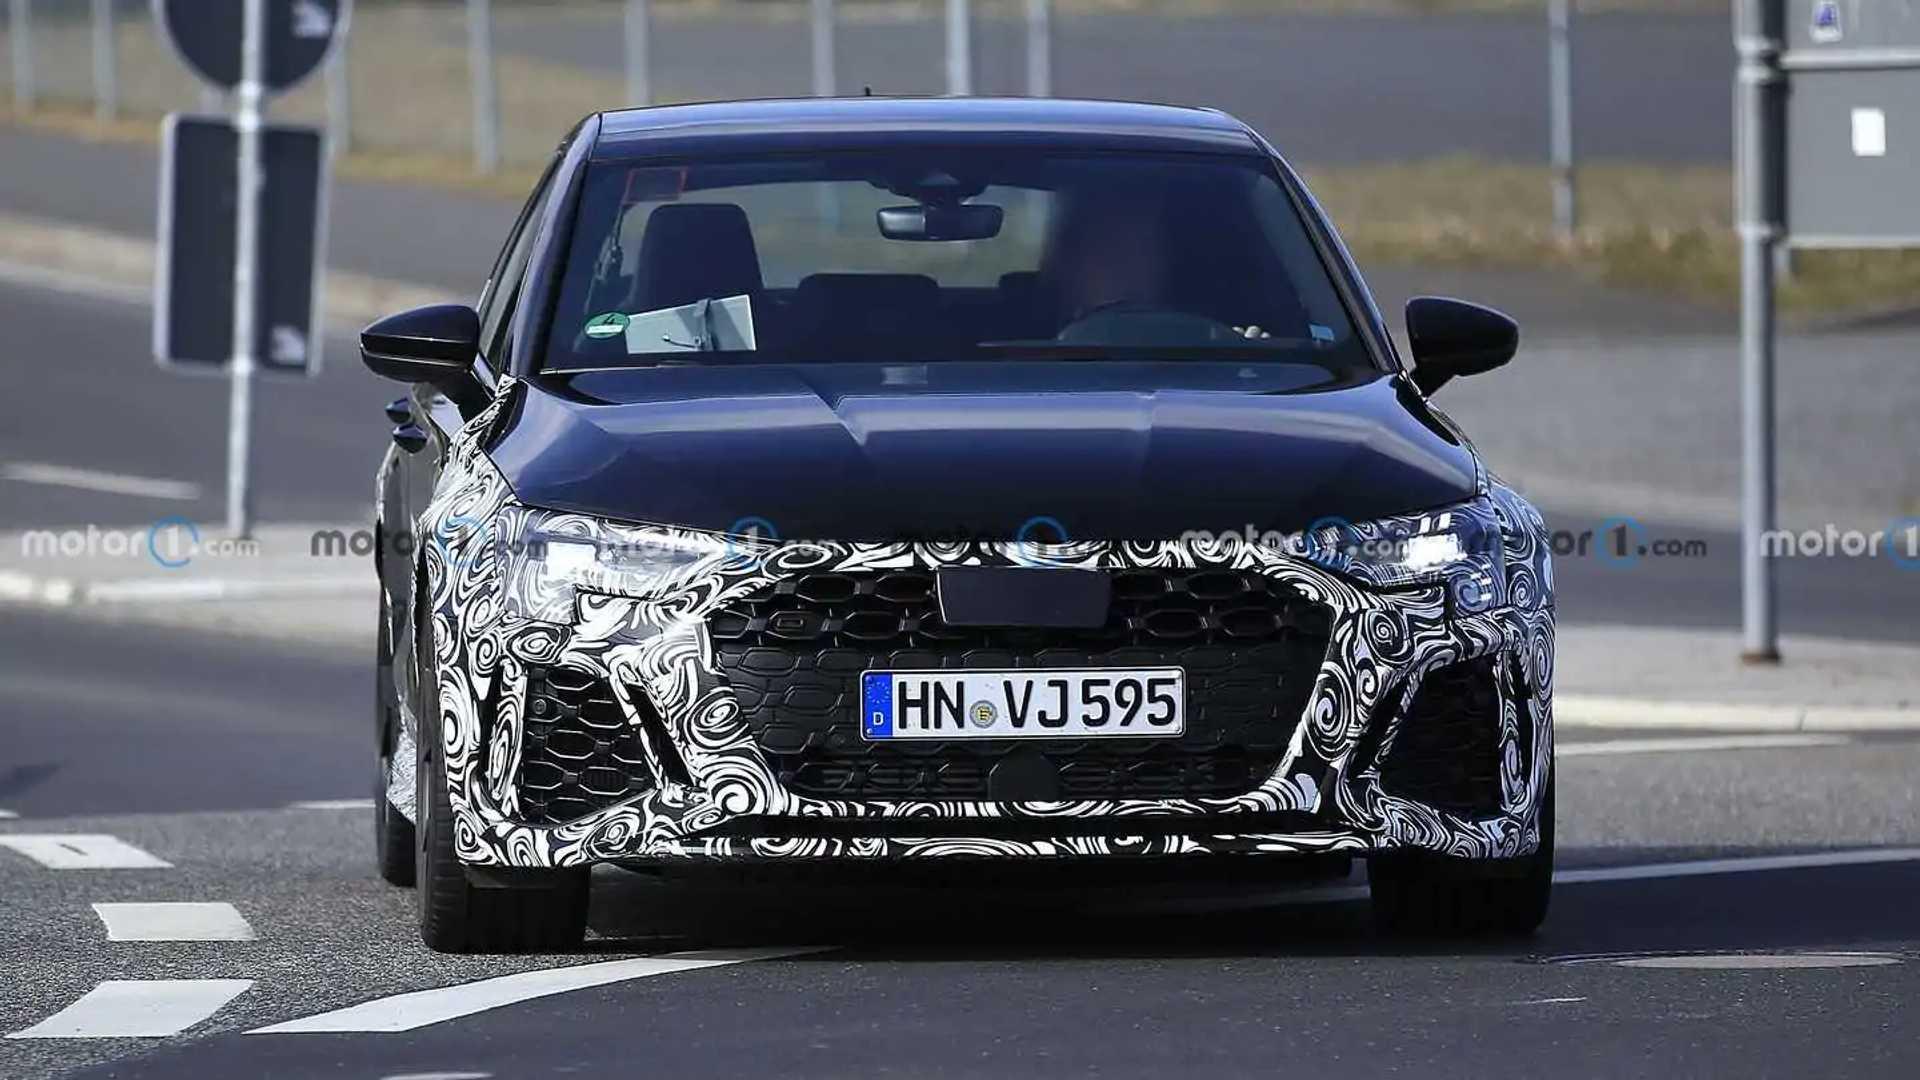 2022 Audi RS3 Sportback spy photo